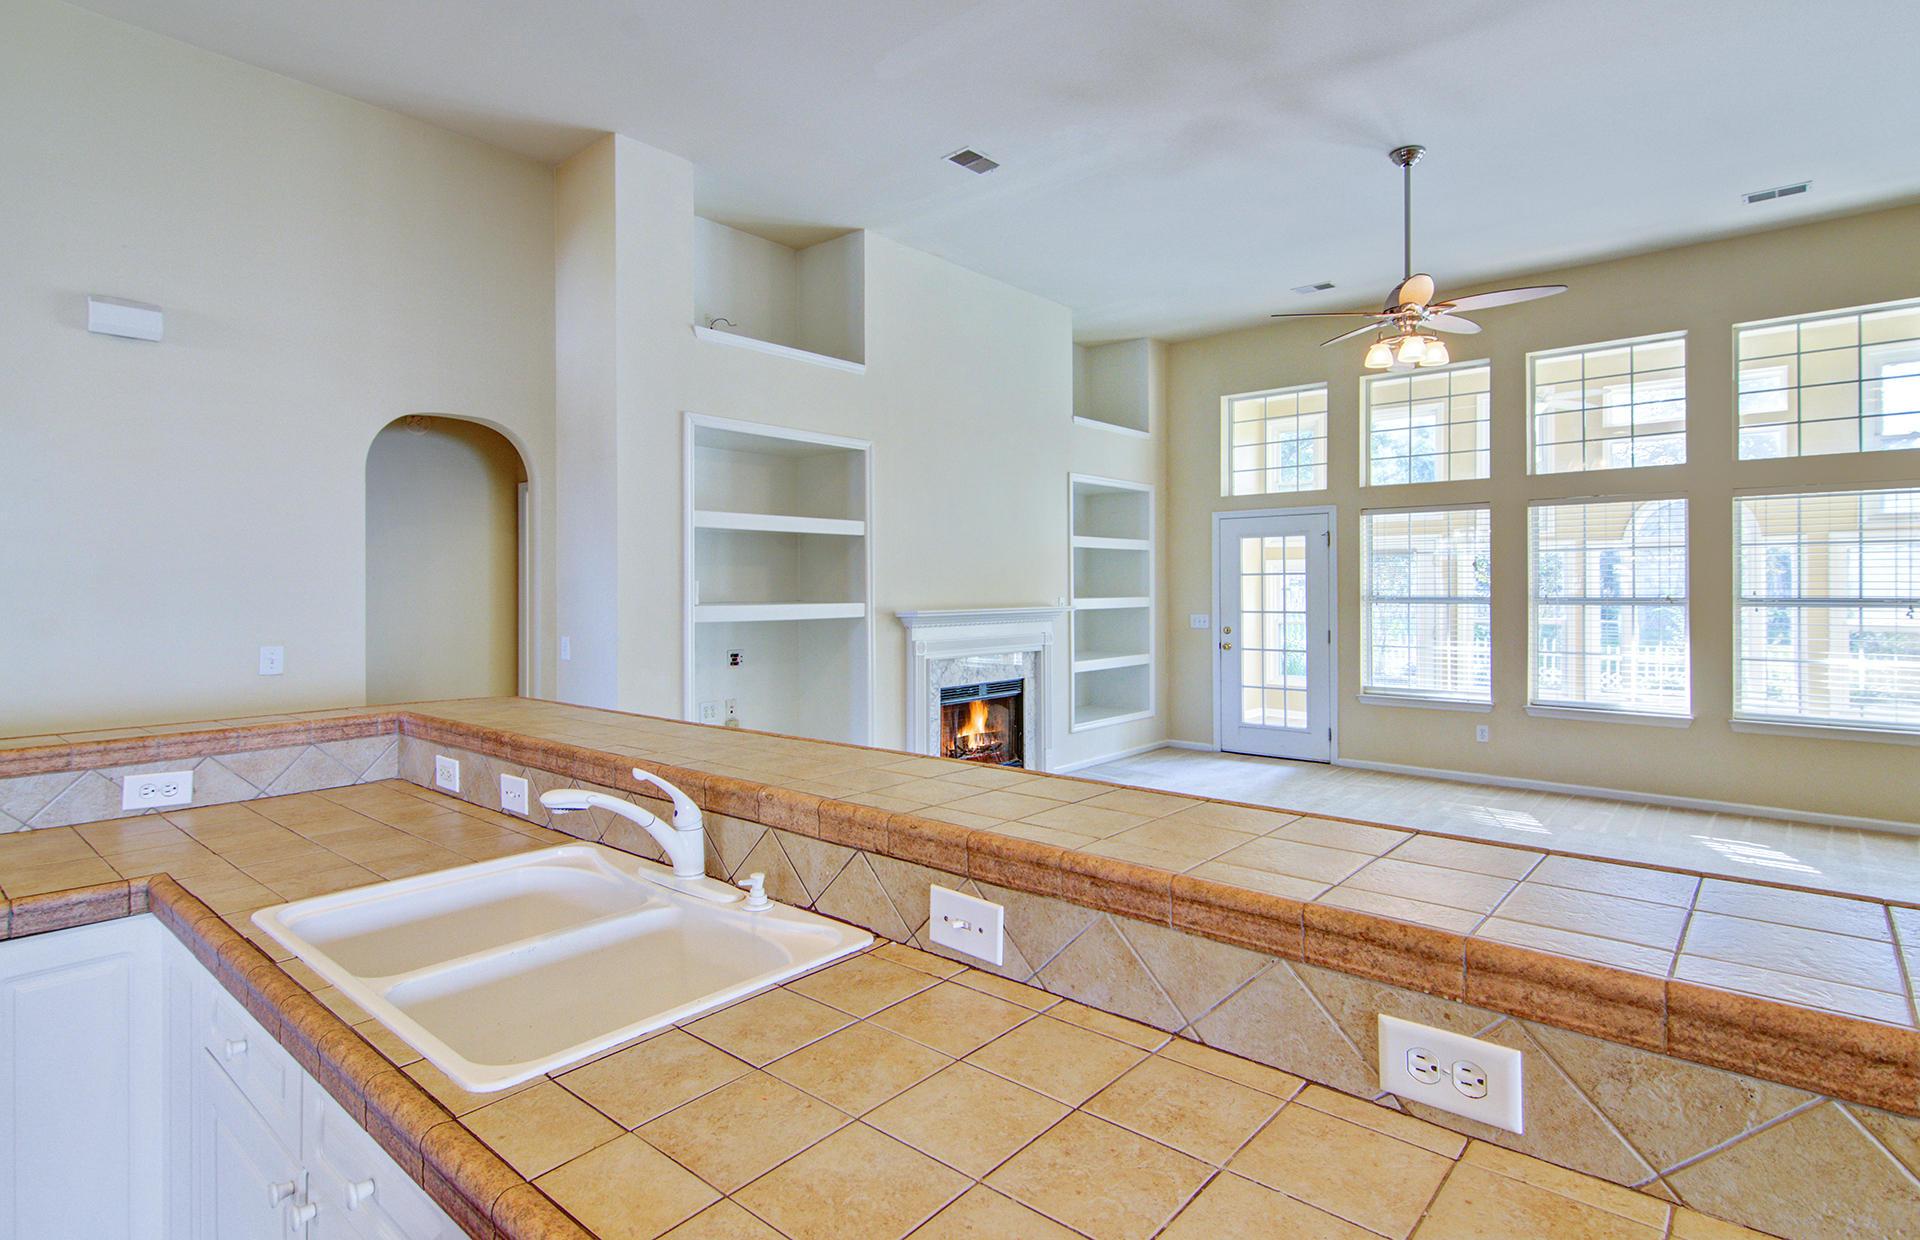 Grand Oaks Plantation Homes For Sale - 1013 Tyron, Charleston, SC - 20